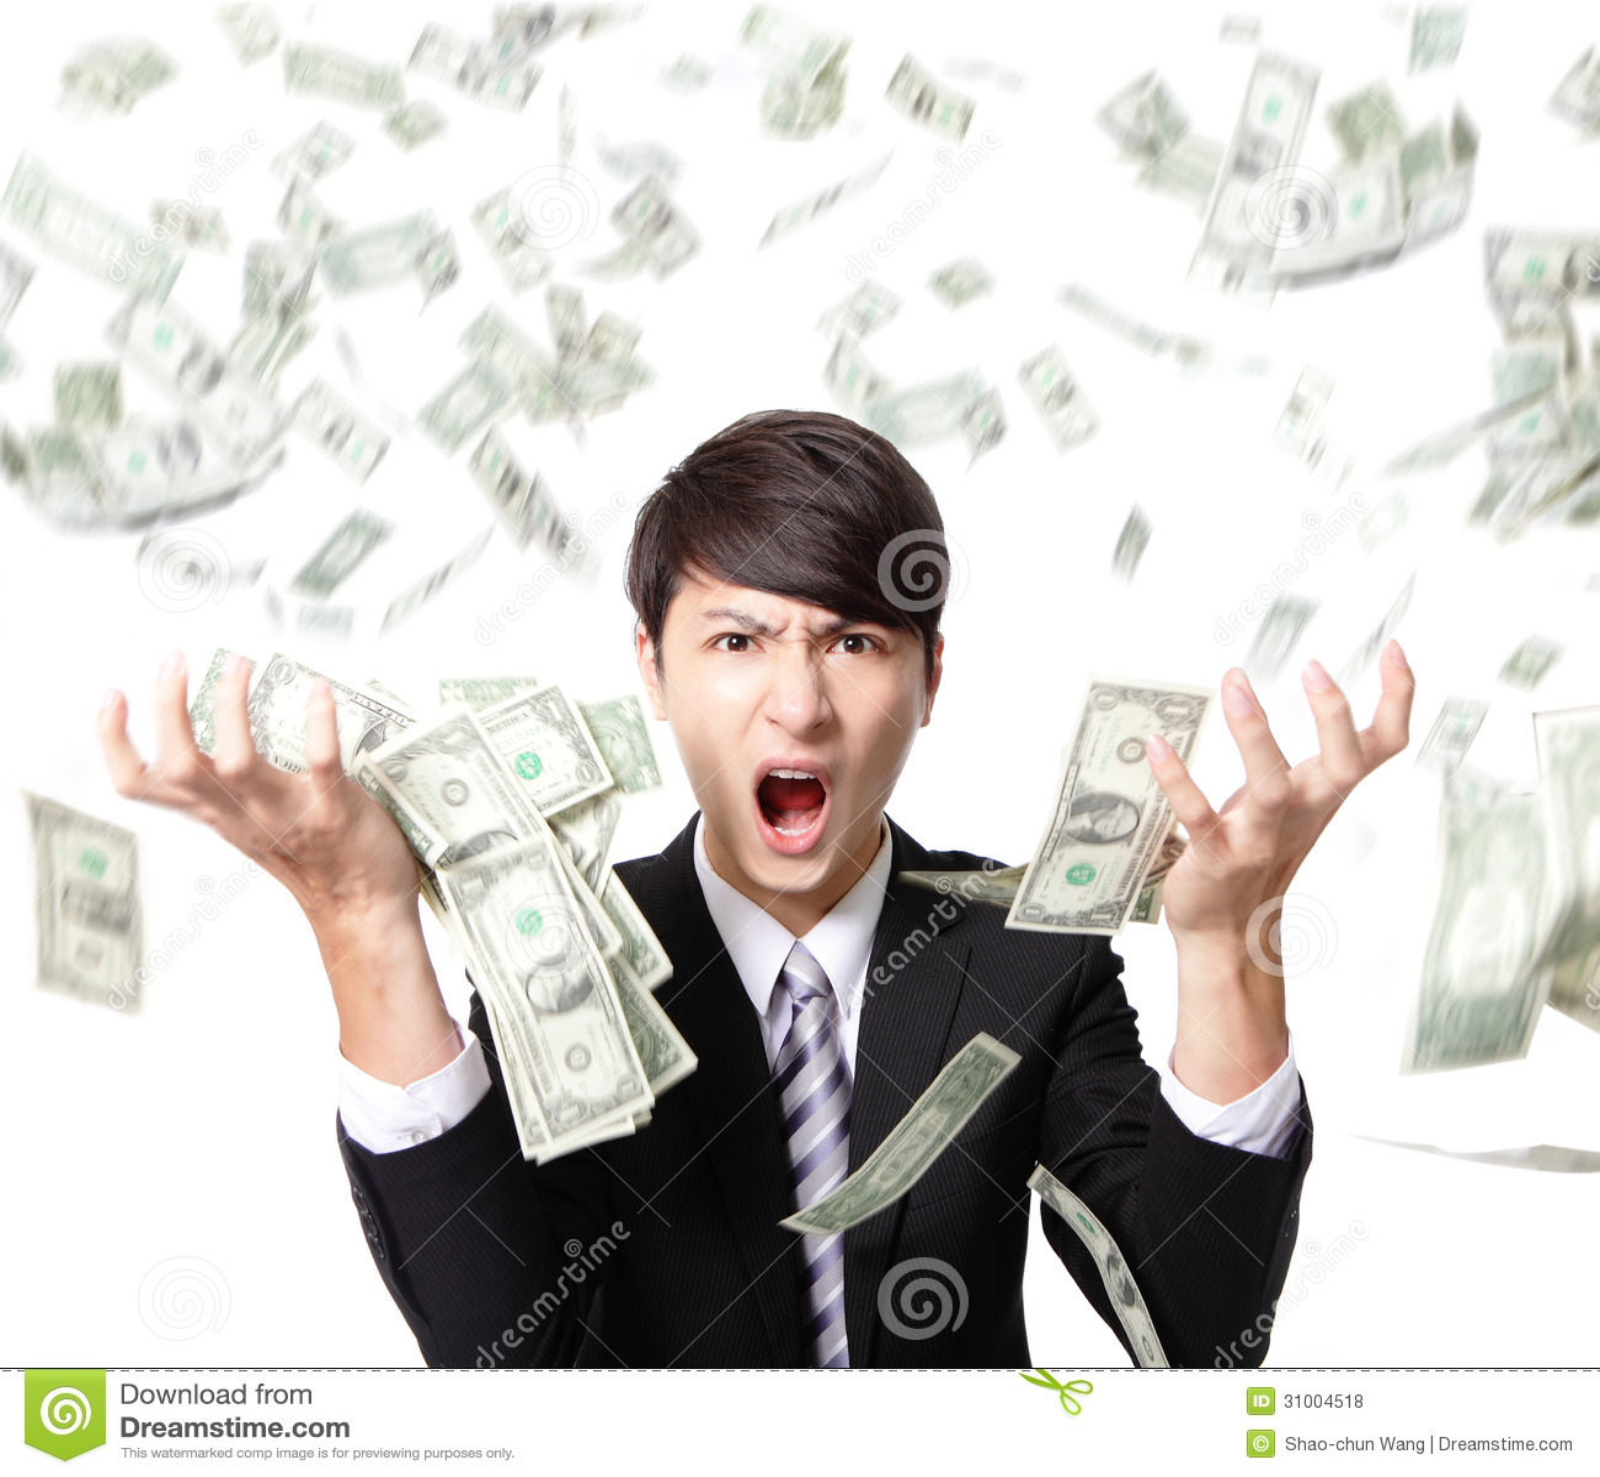 business-man-anger-shouting-money-rain-f